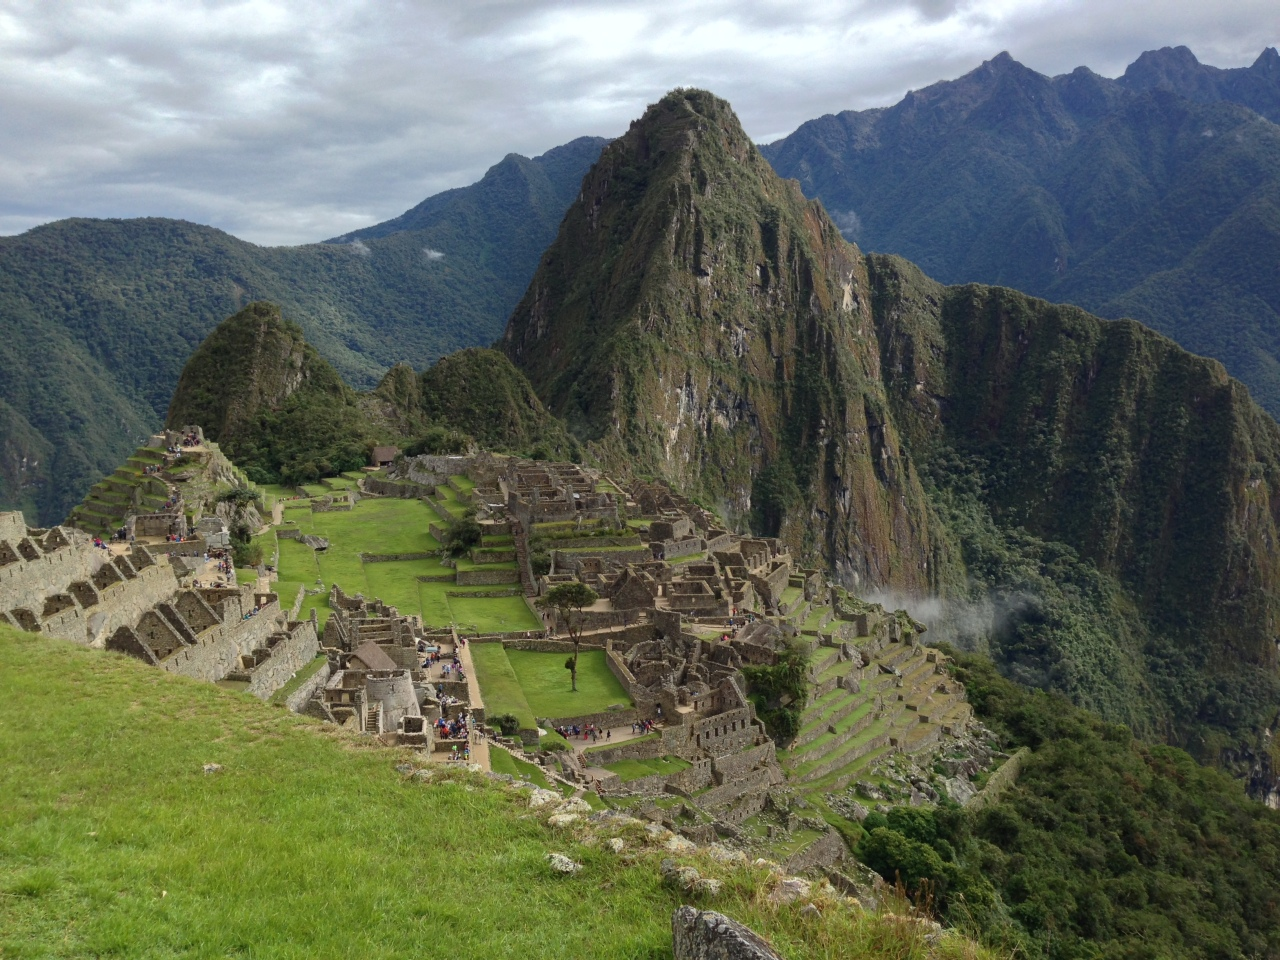 Peru- Salkantay trek to MacchuPicchu